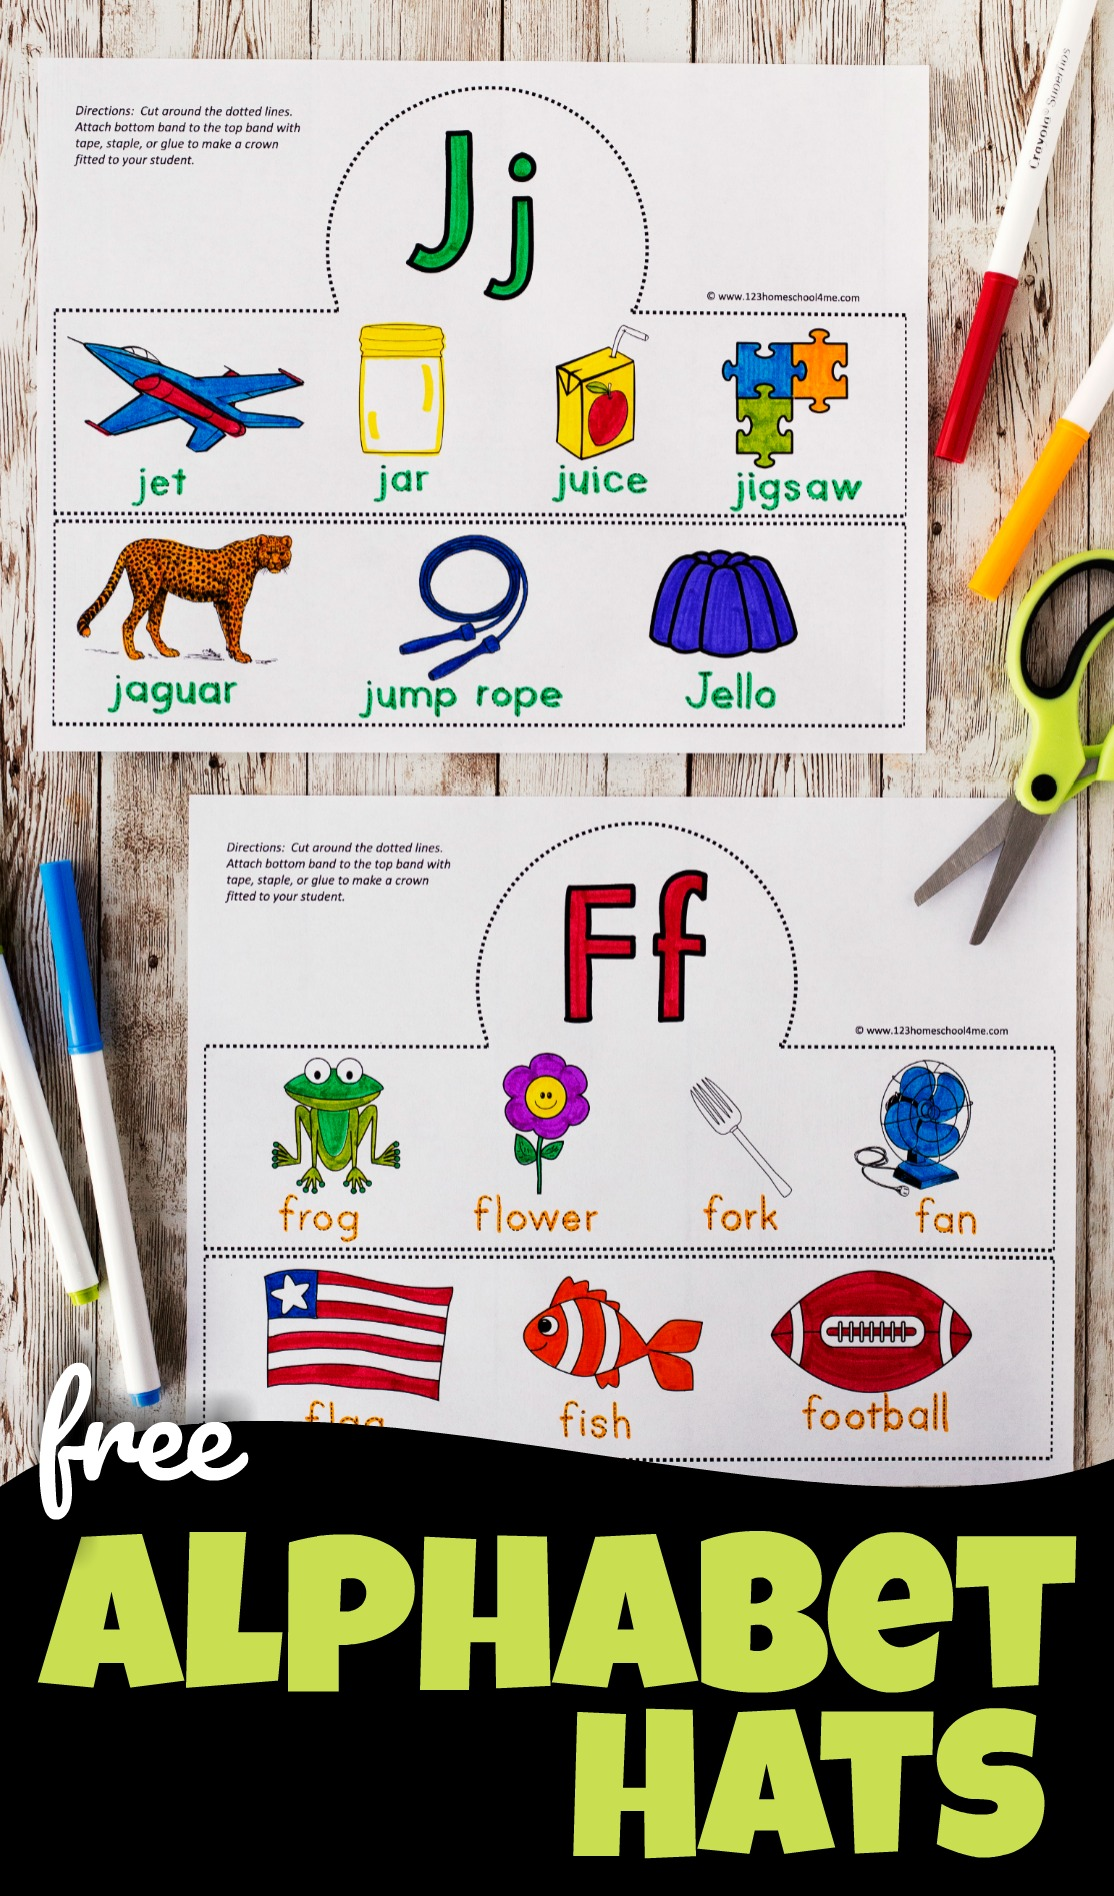 Free Alphabet Hats